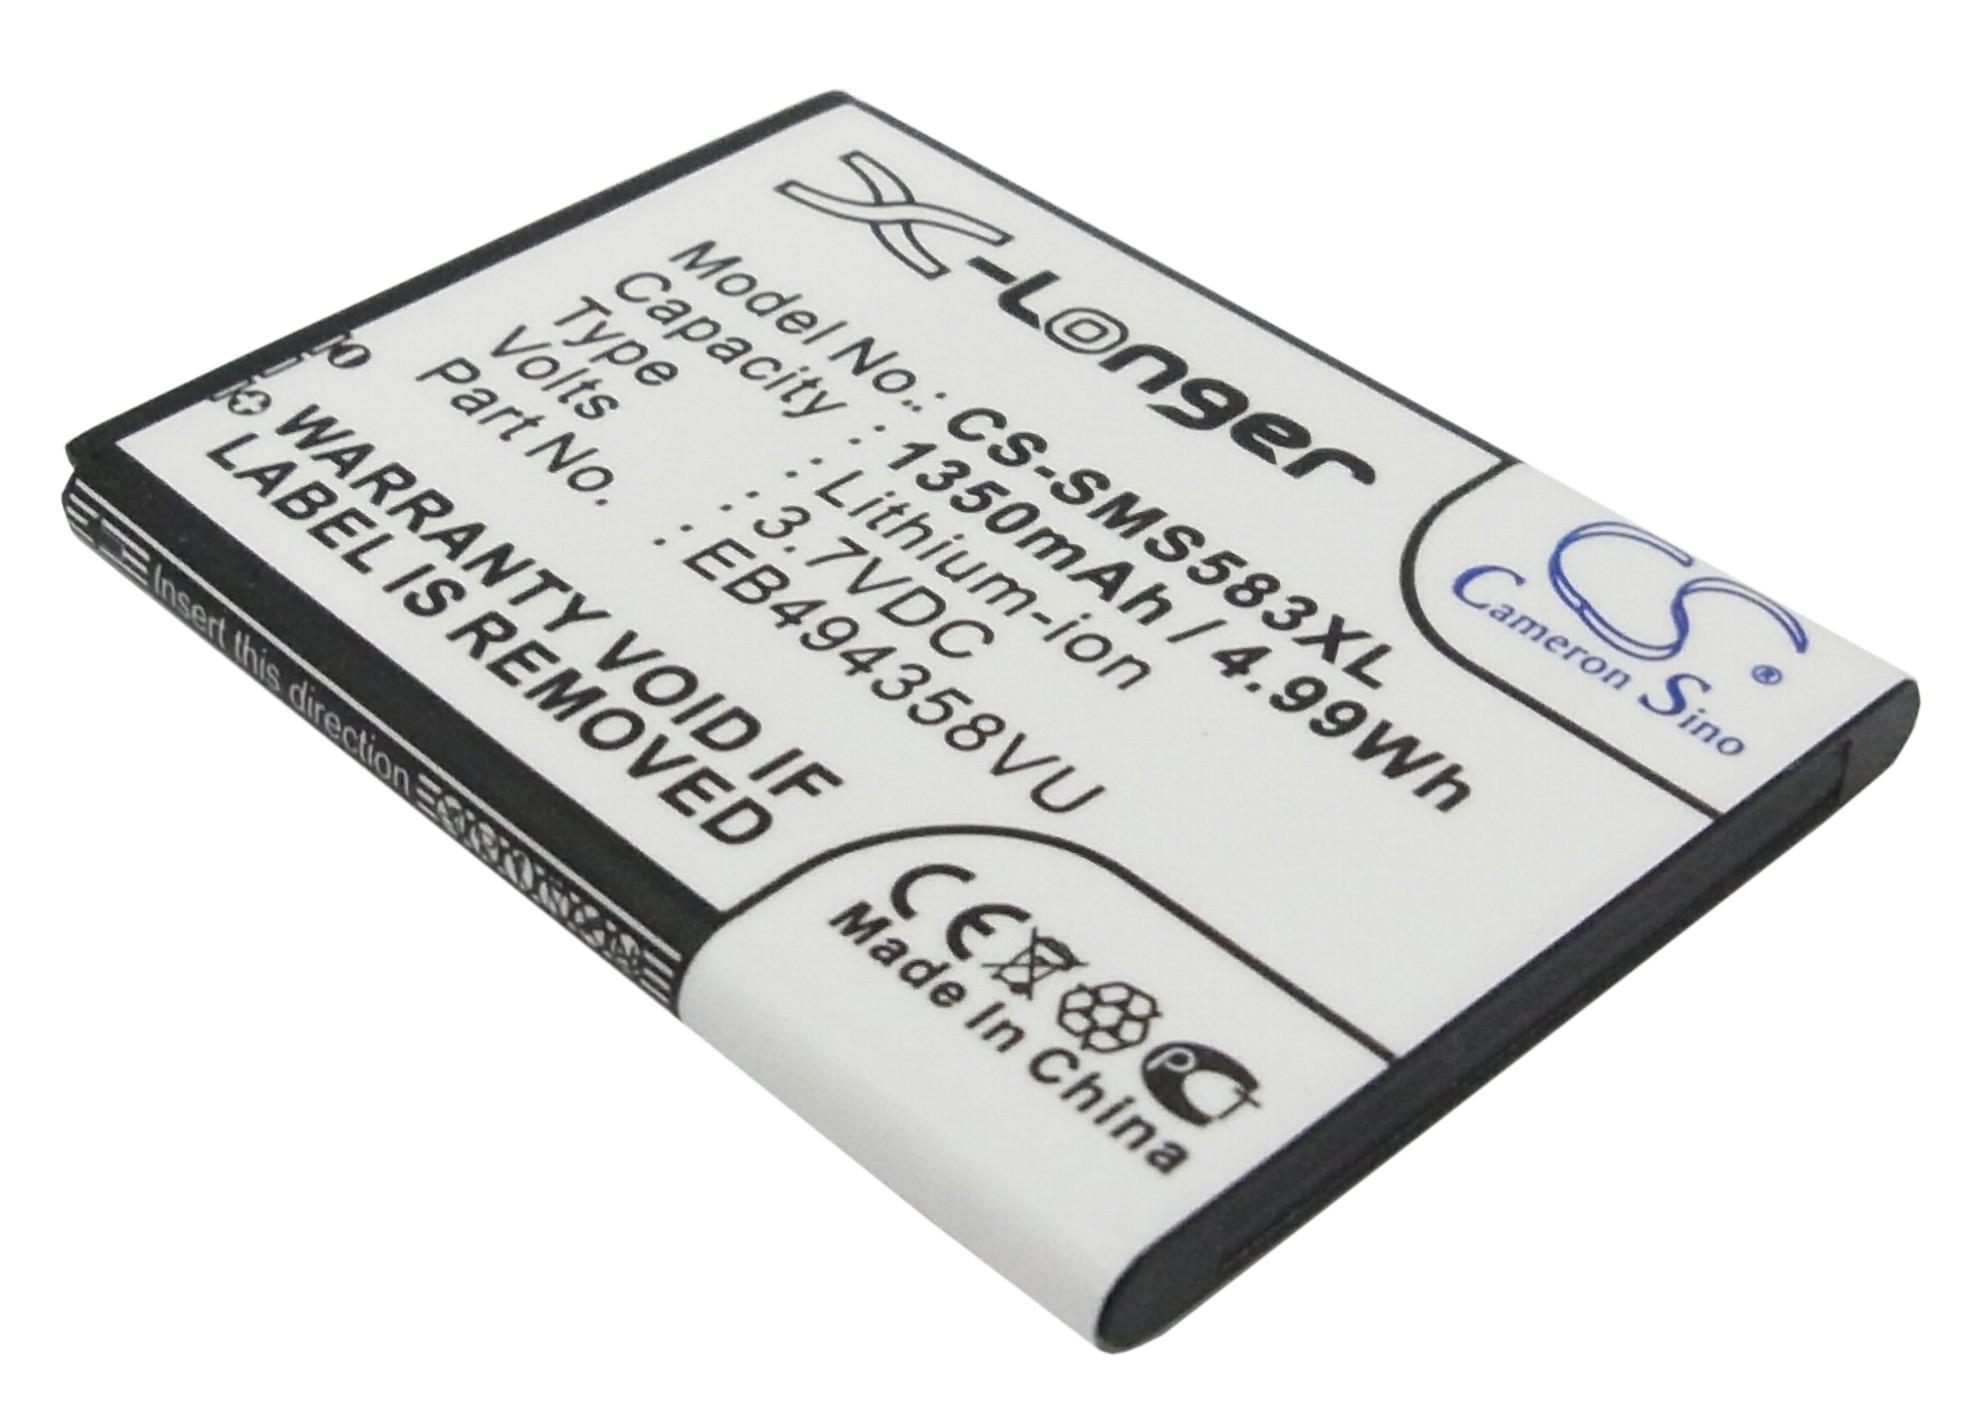 Cameron Sino baterie do mobilů pro SAMSUNG GT-S5830i 3.7V Li-ion 1350mAh černá - neoriginální